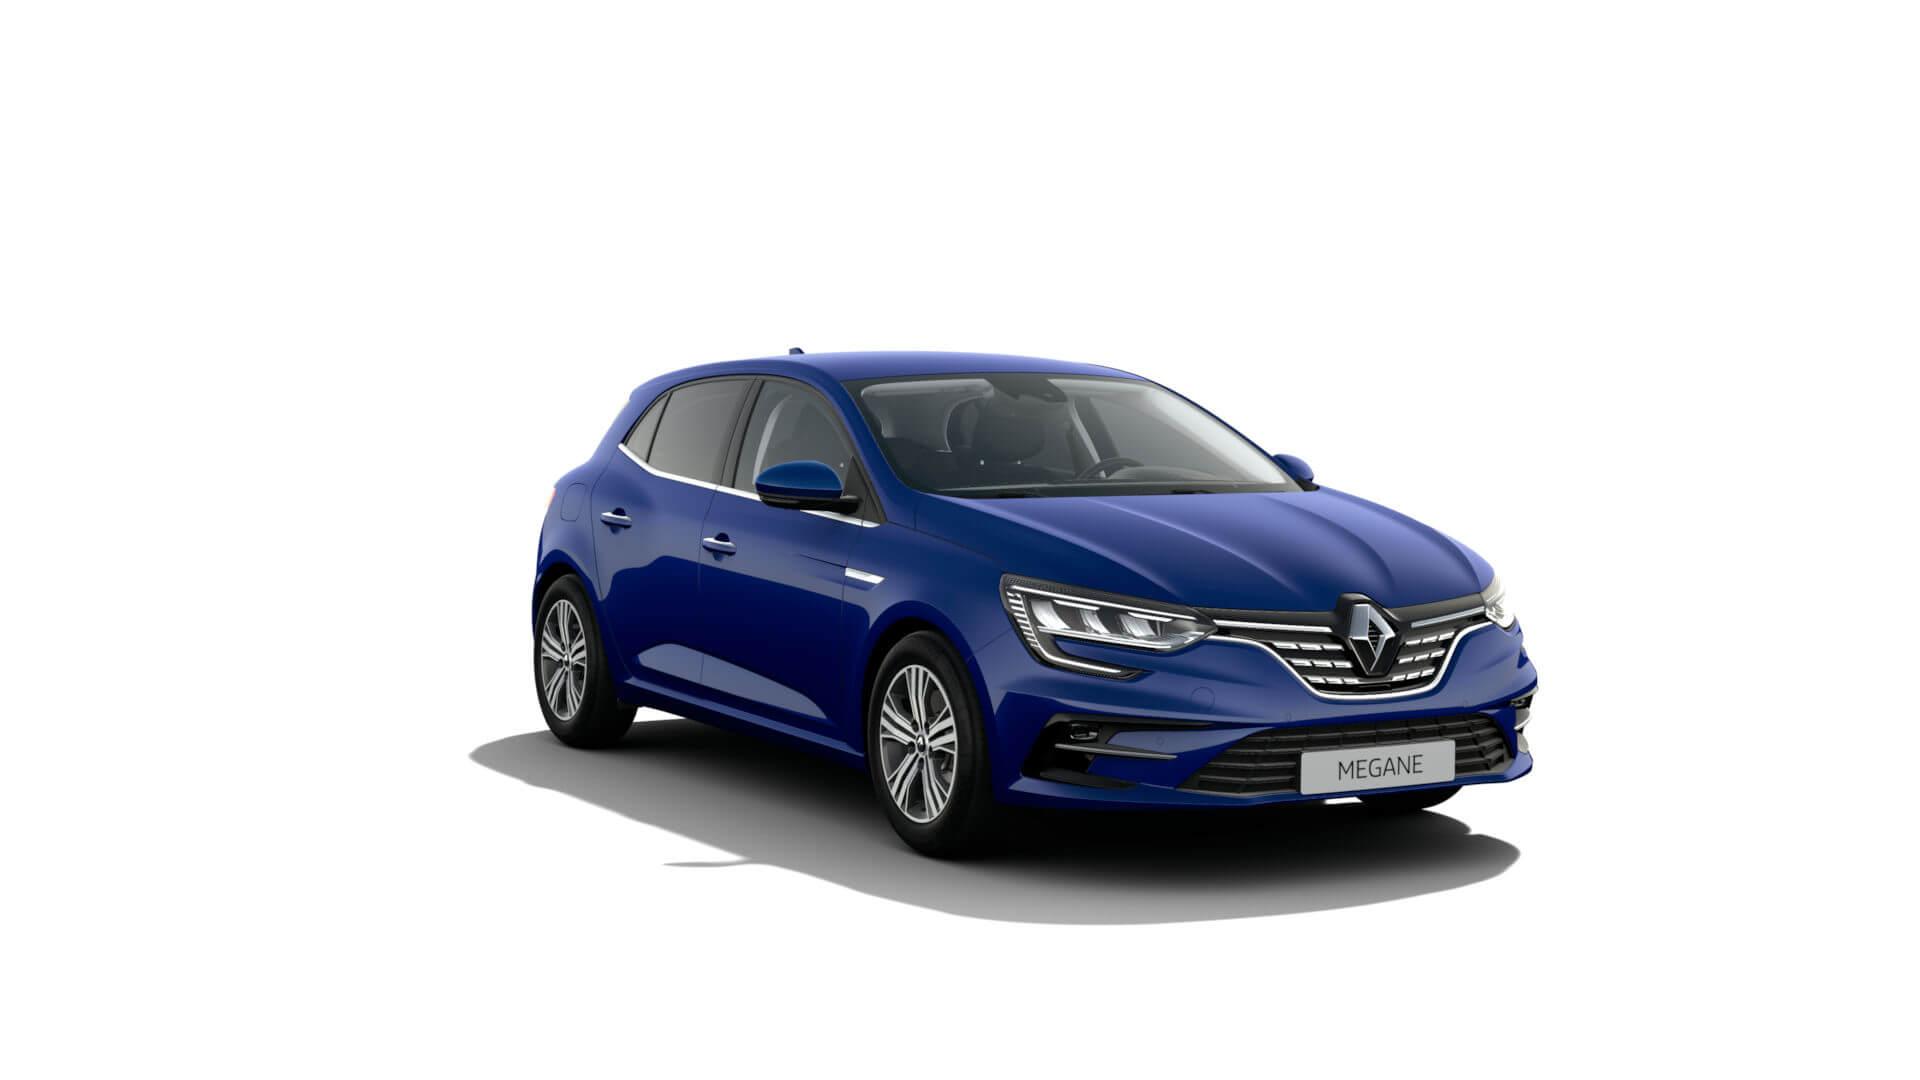 Automodell blau - Renault Megane - Renault Ahrens Hannover